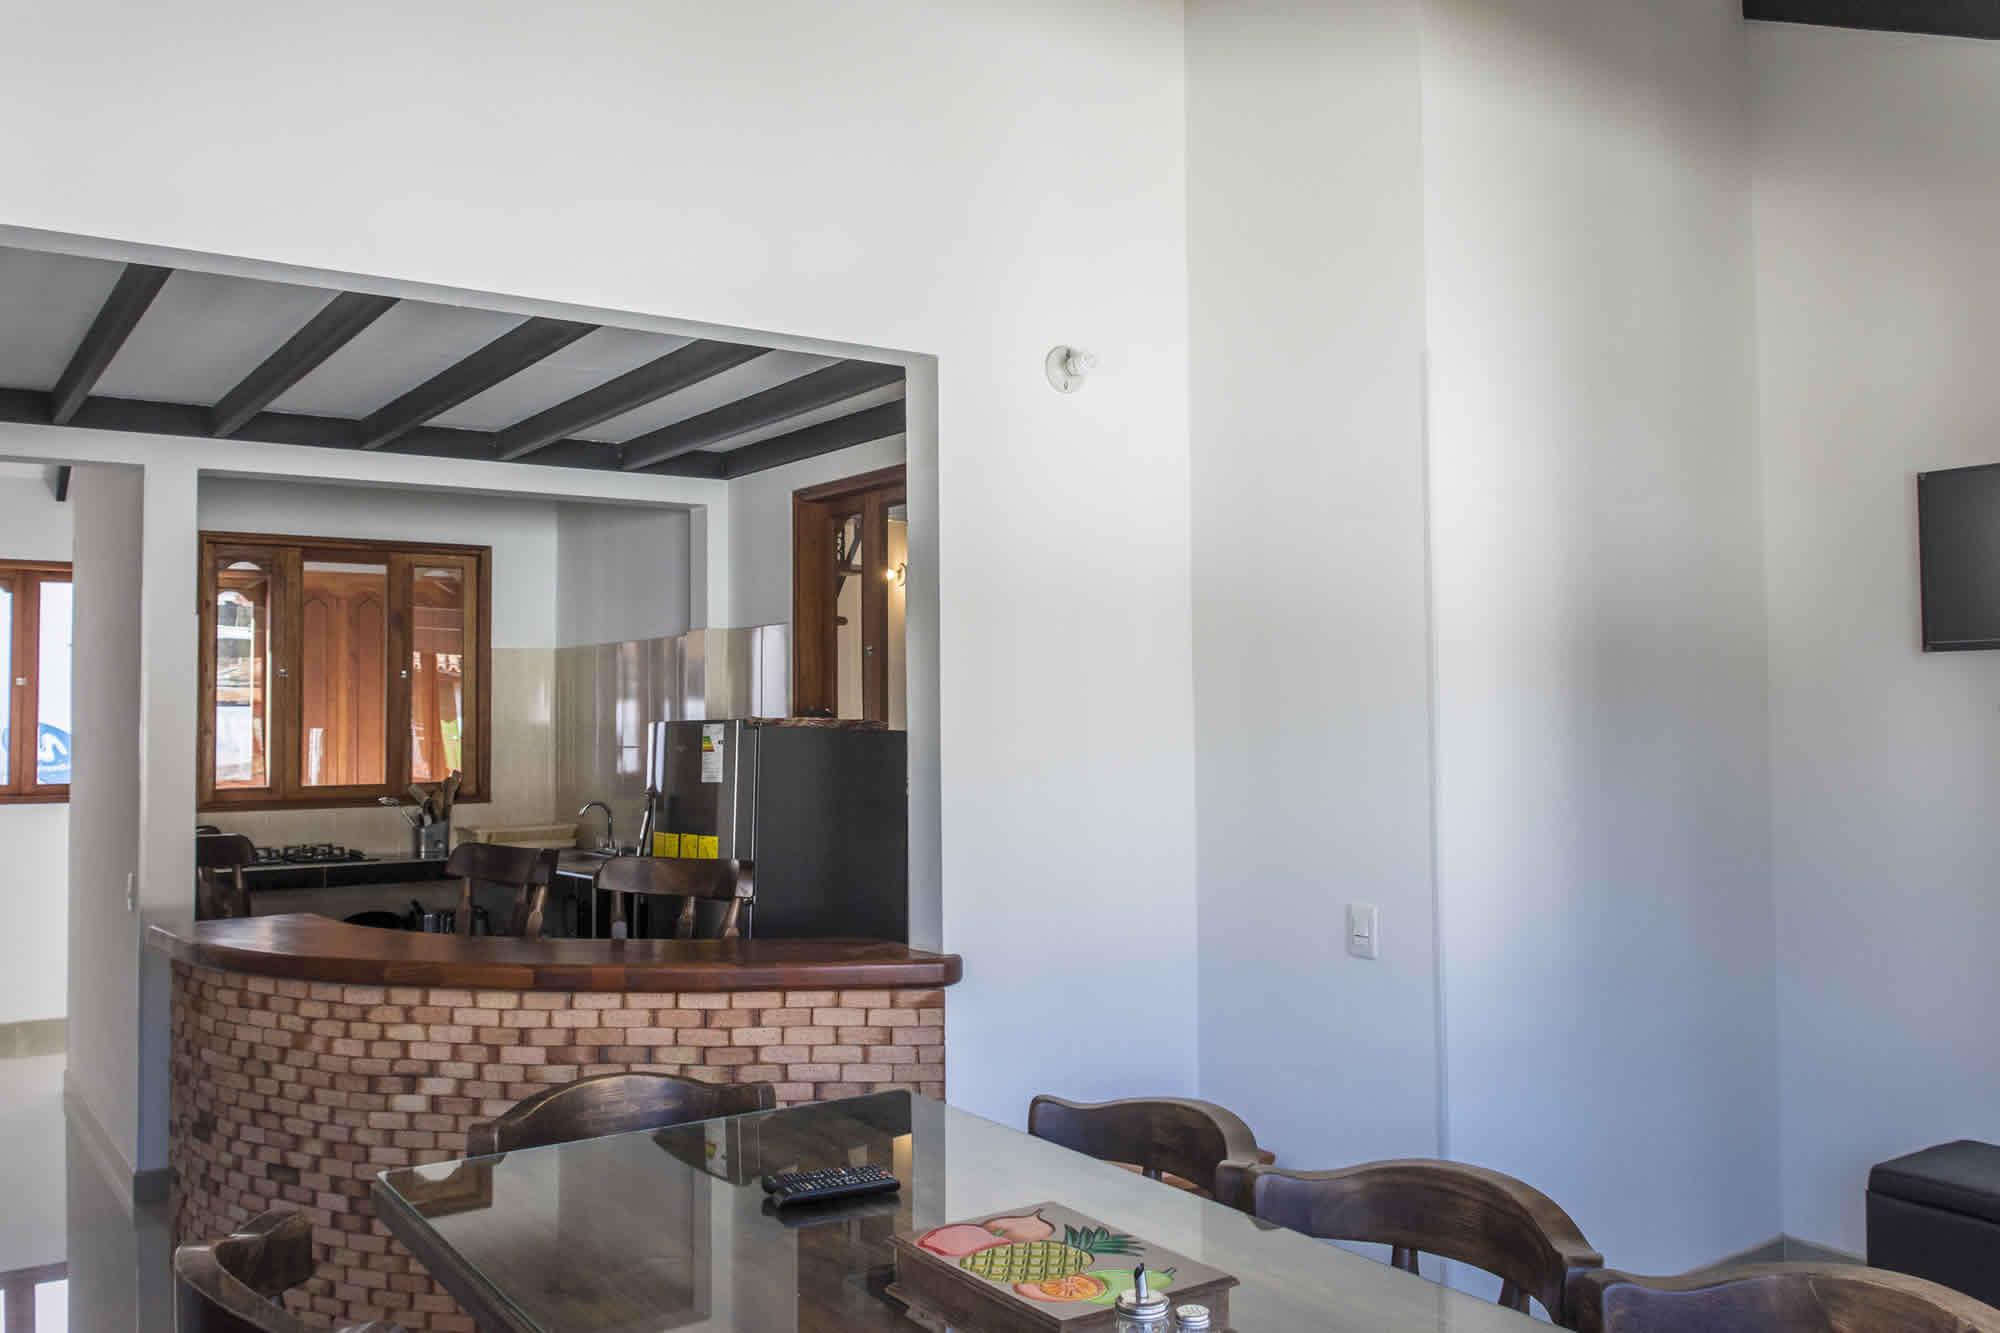 Alquiler apartamento Galán Villa de Leyva